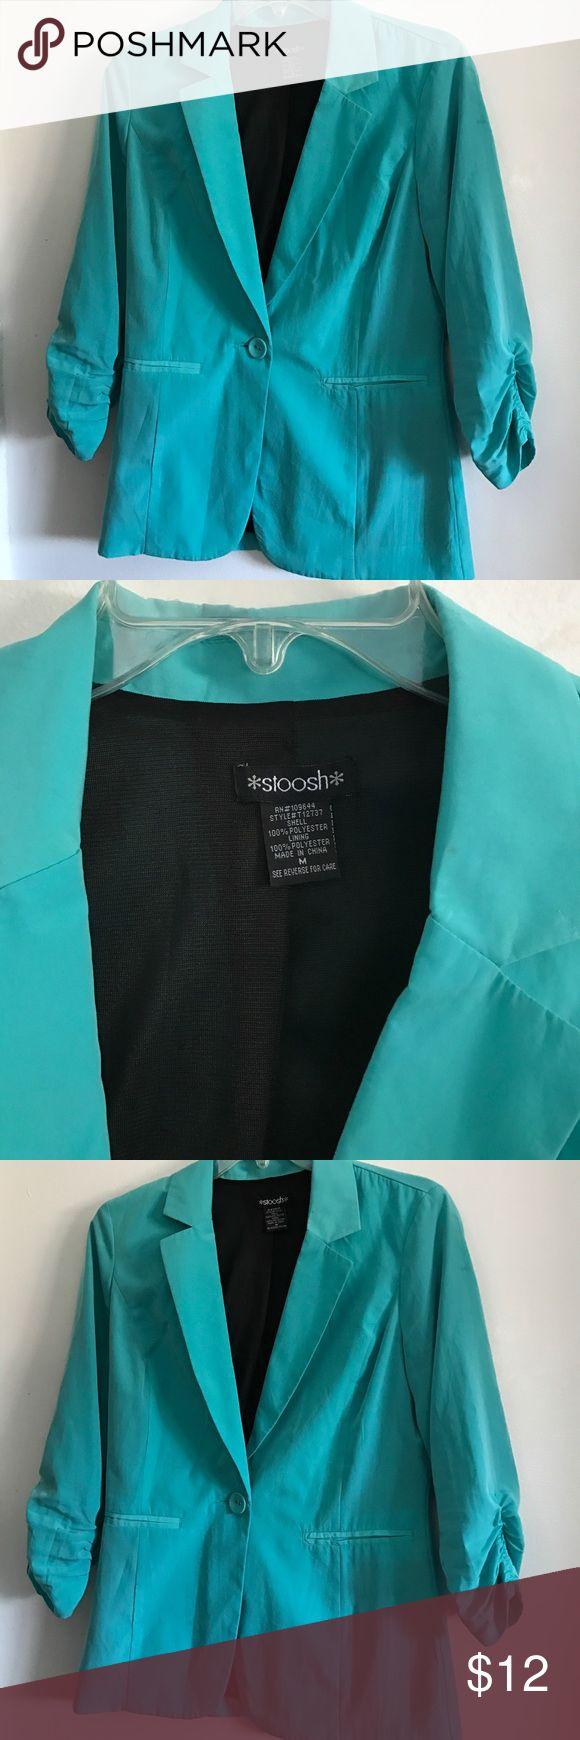 Super soft Rauched sleeves Turquoise blazer Very nice soft 55% linen, 45% rayon  turquoise blazer. Stoosh Jackets & Coats Blazers